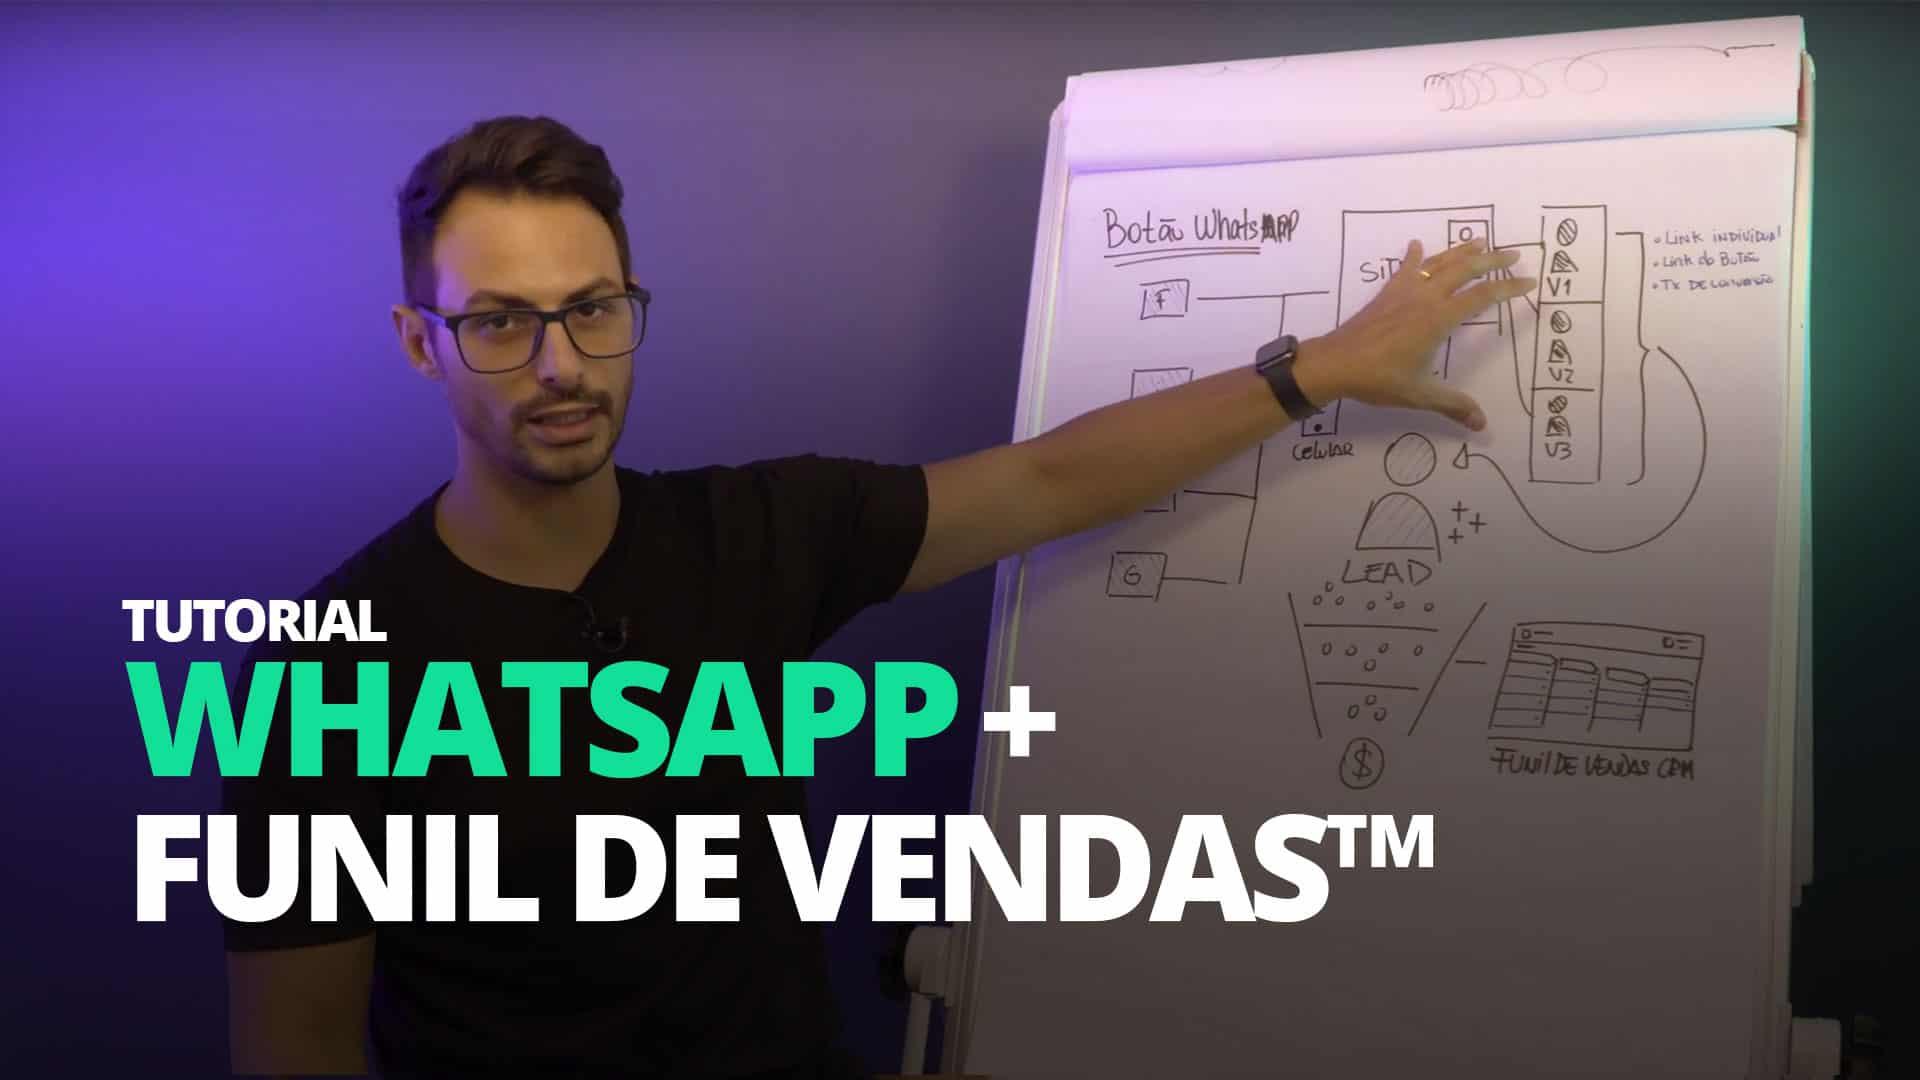 Whatsapp Funil de Vendas